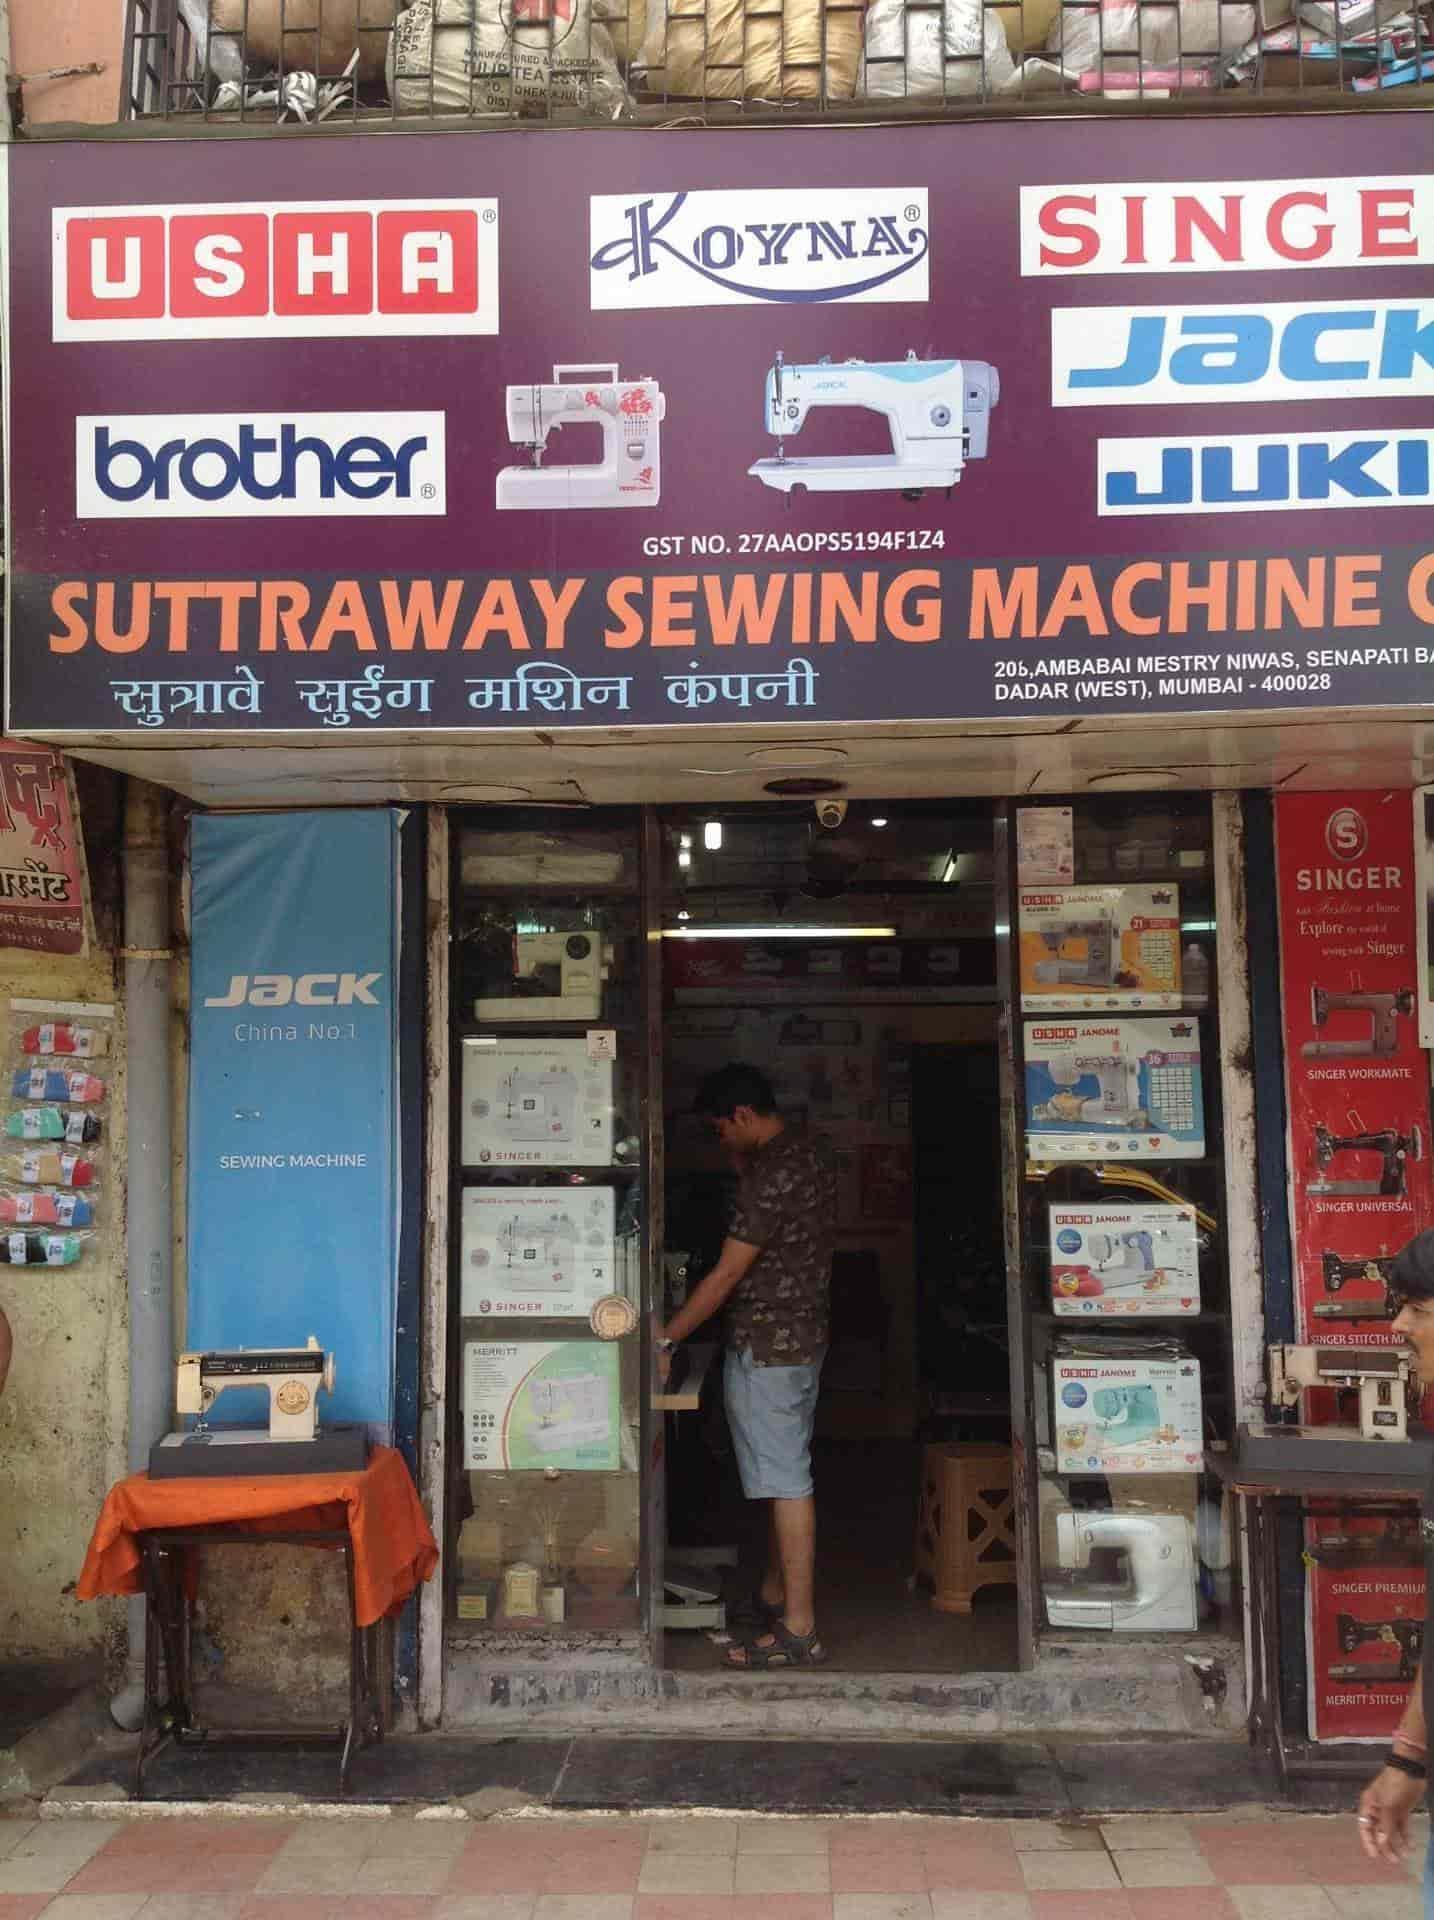 suttraway sewing machine co mumbai 0lr4benswc